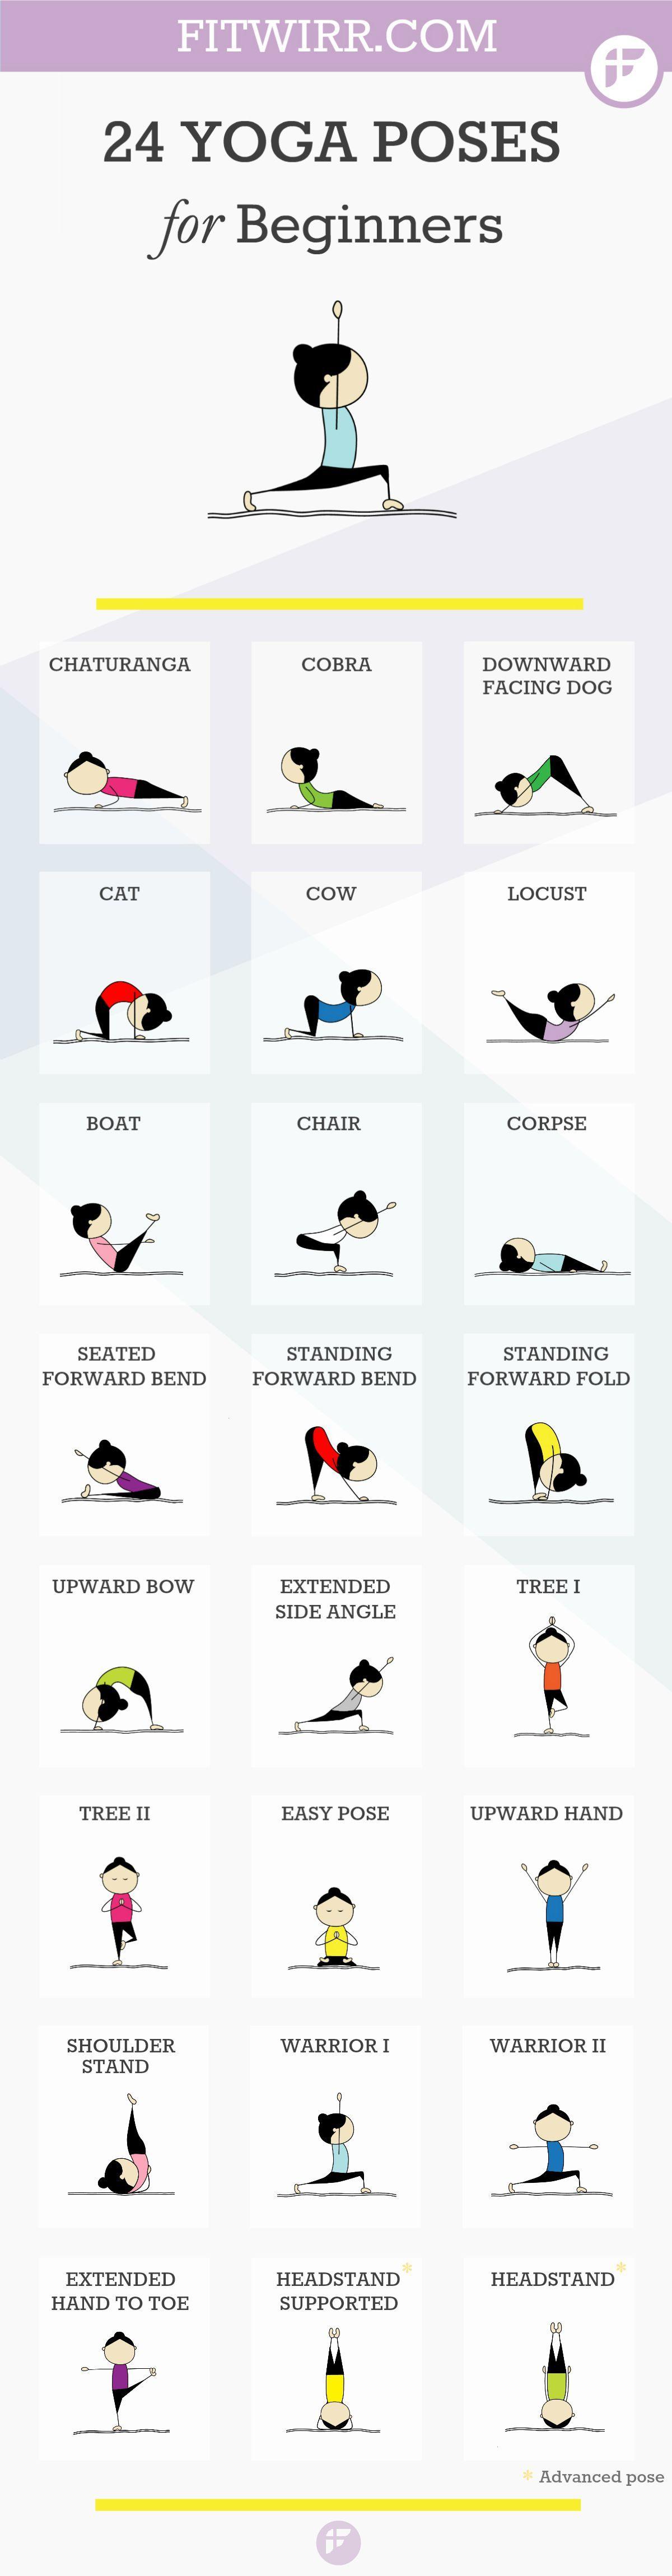 24 Essential Yoga Poses For Beginners Videos Fitwirr Easy Yoga Workouts Yoga Poses For Beginners Yoga Asanas